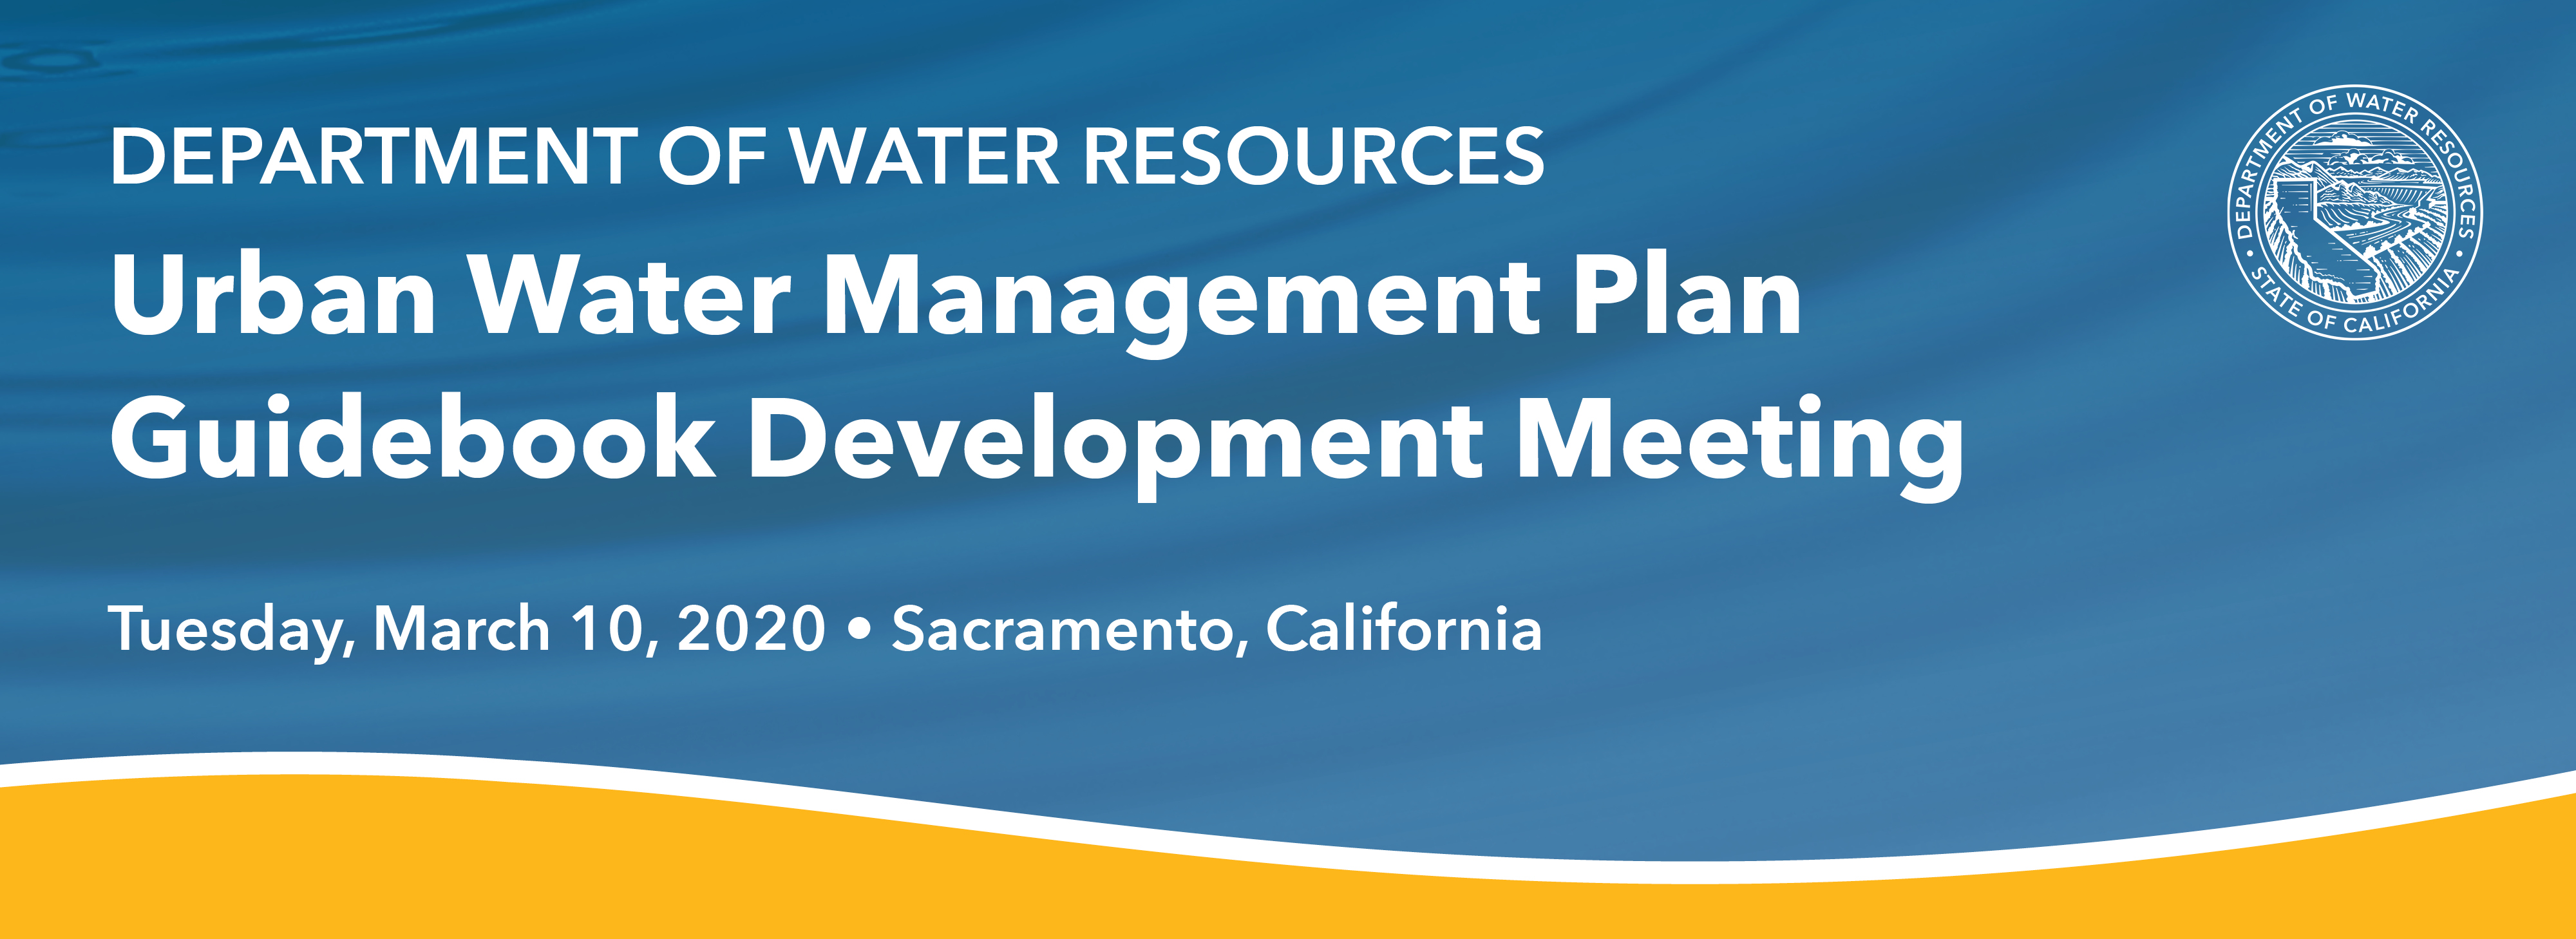 Urban Water Management Plan Guidebook Development Meeting